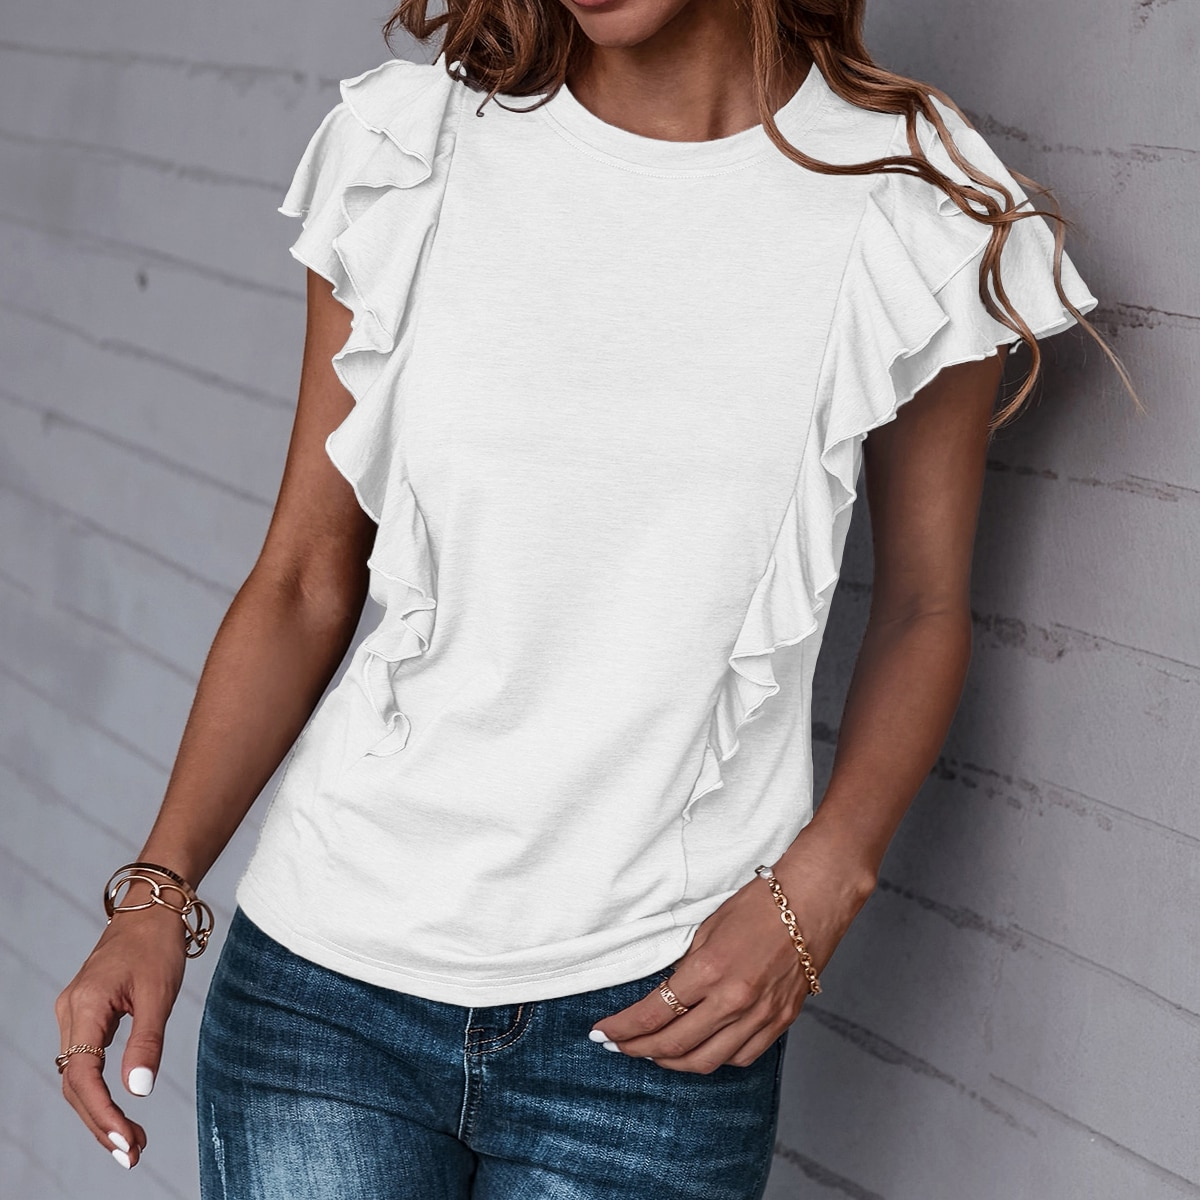 Однотонная футболка SheIn swtee23210609631